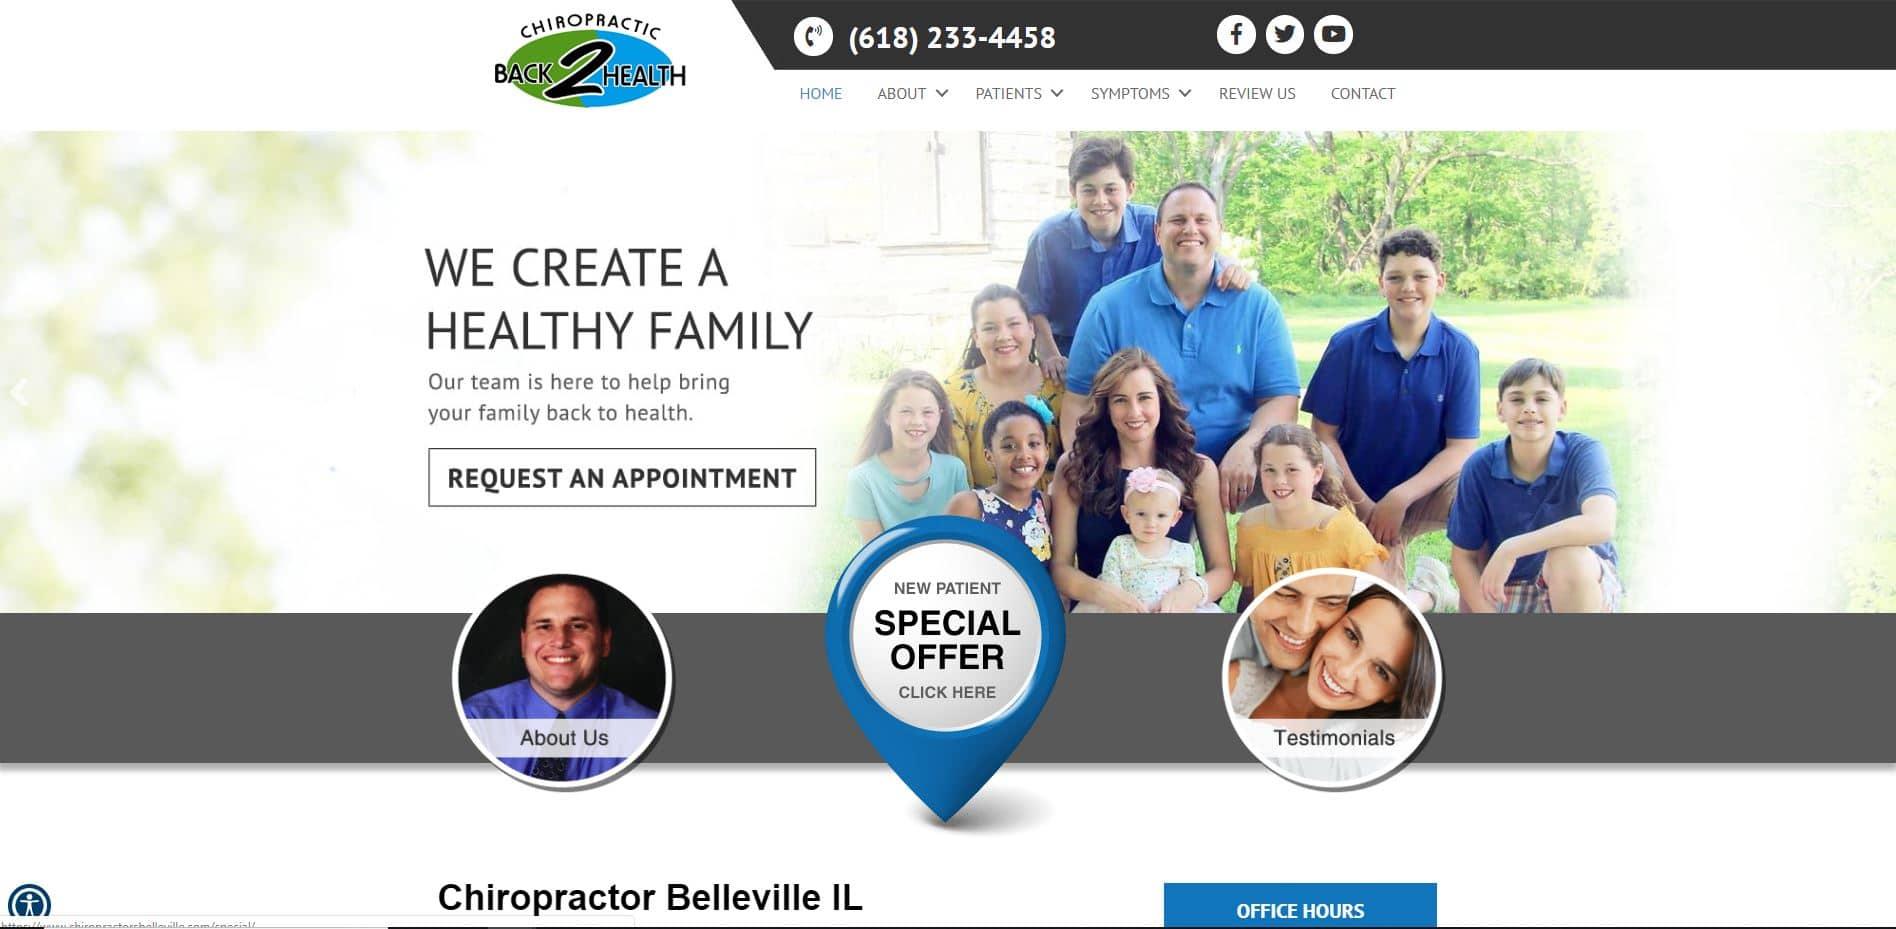 Chiropractor in Belleville